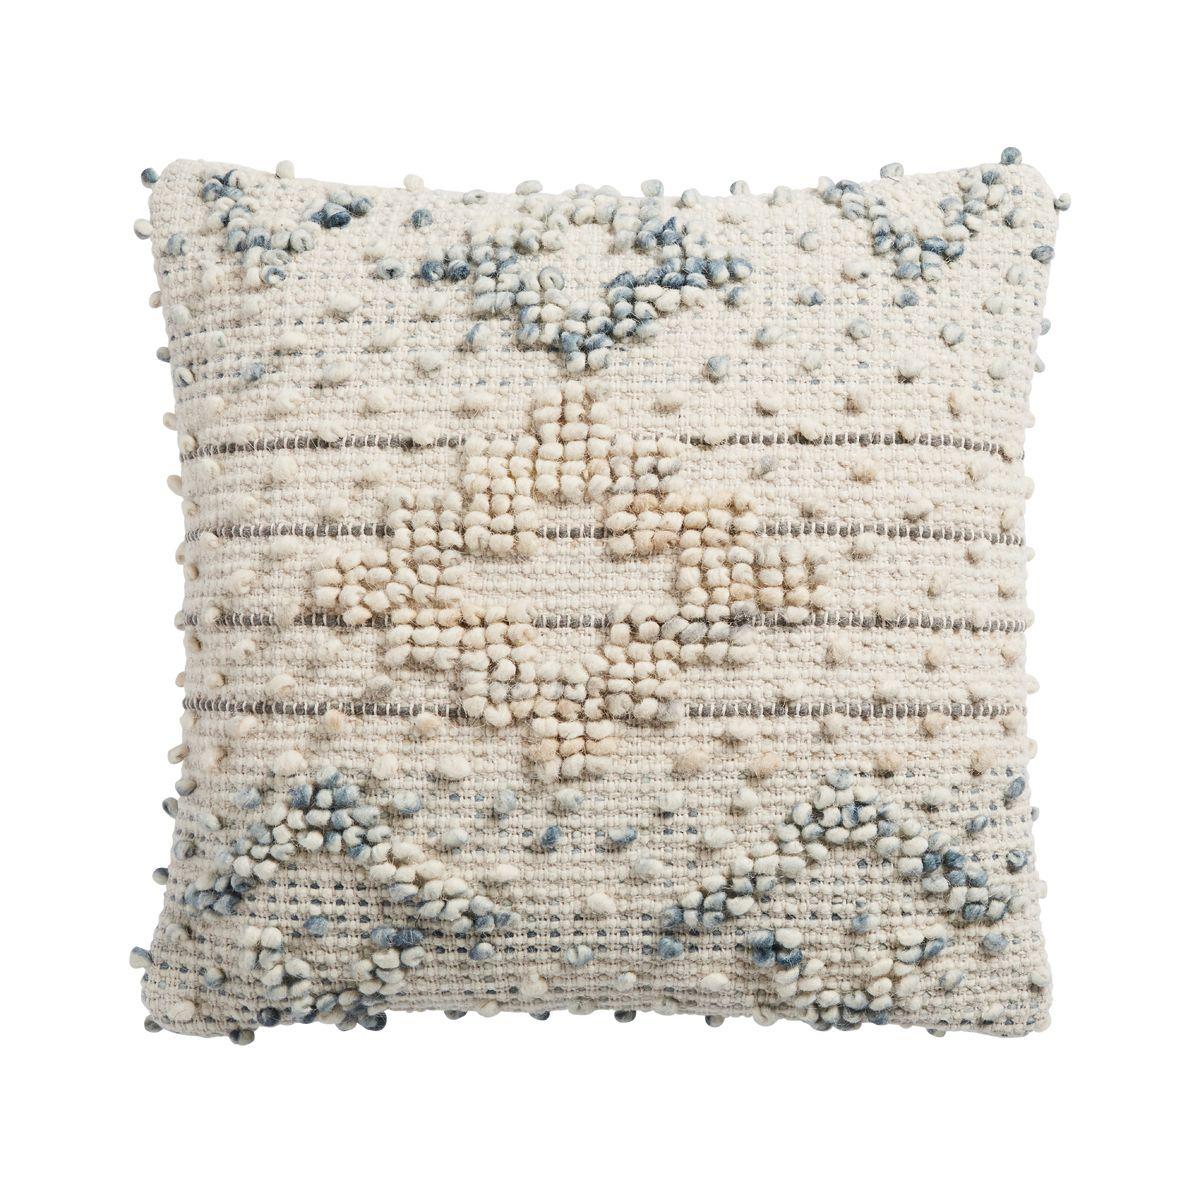 Arhaus motif pillow2 qyxfpo